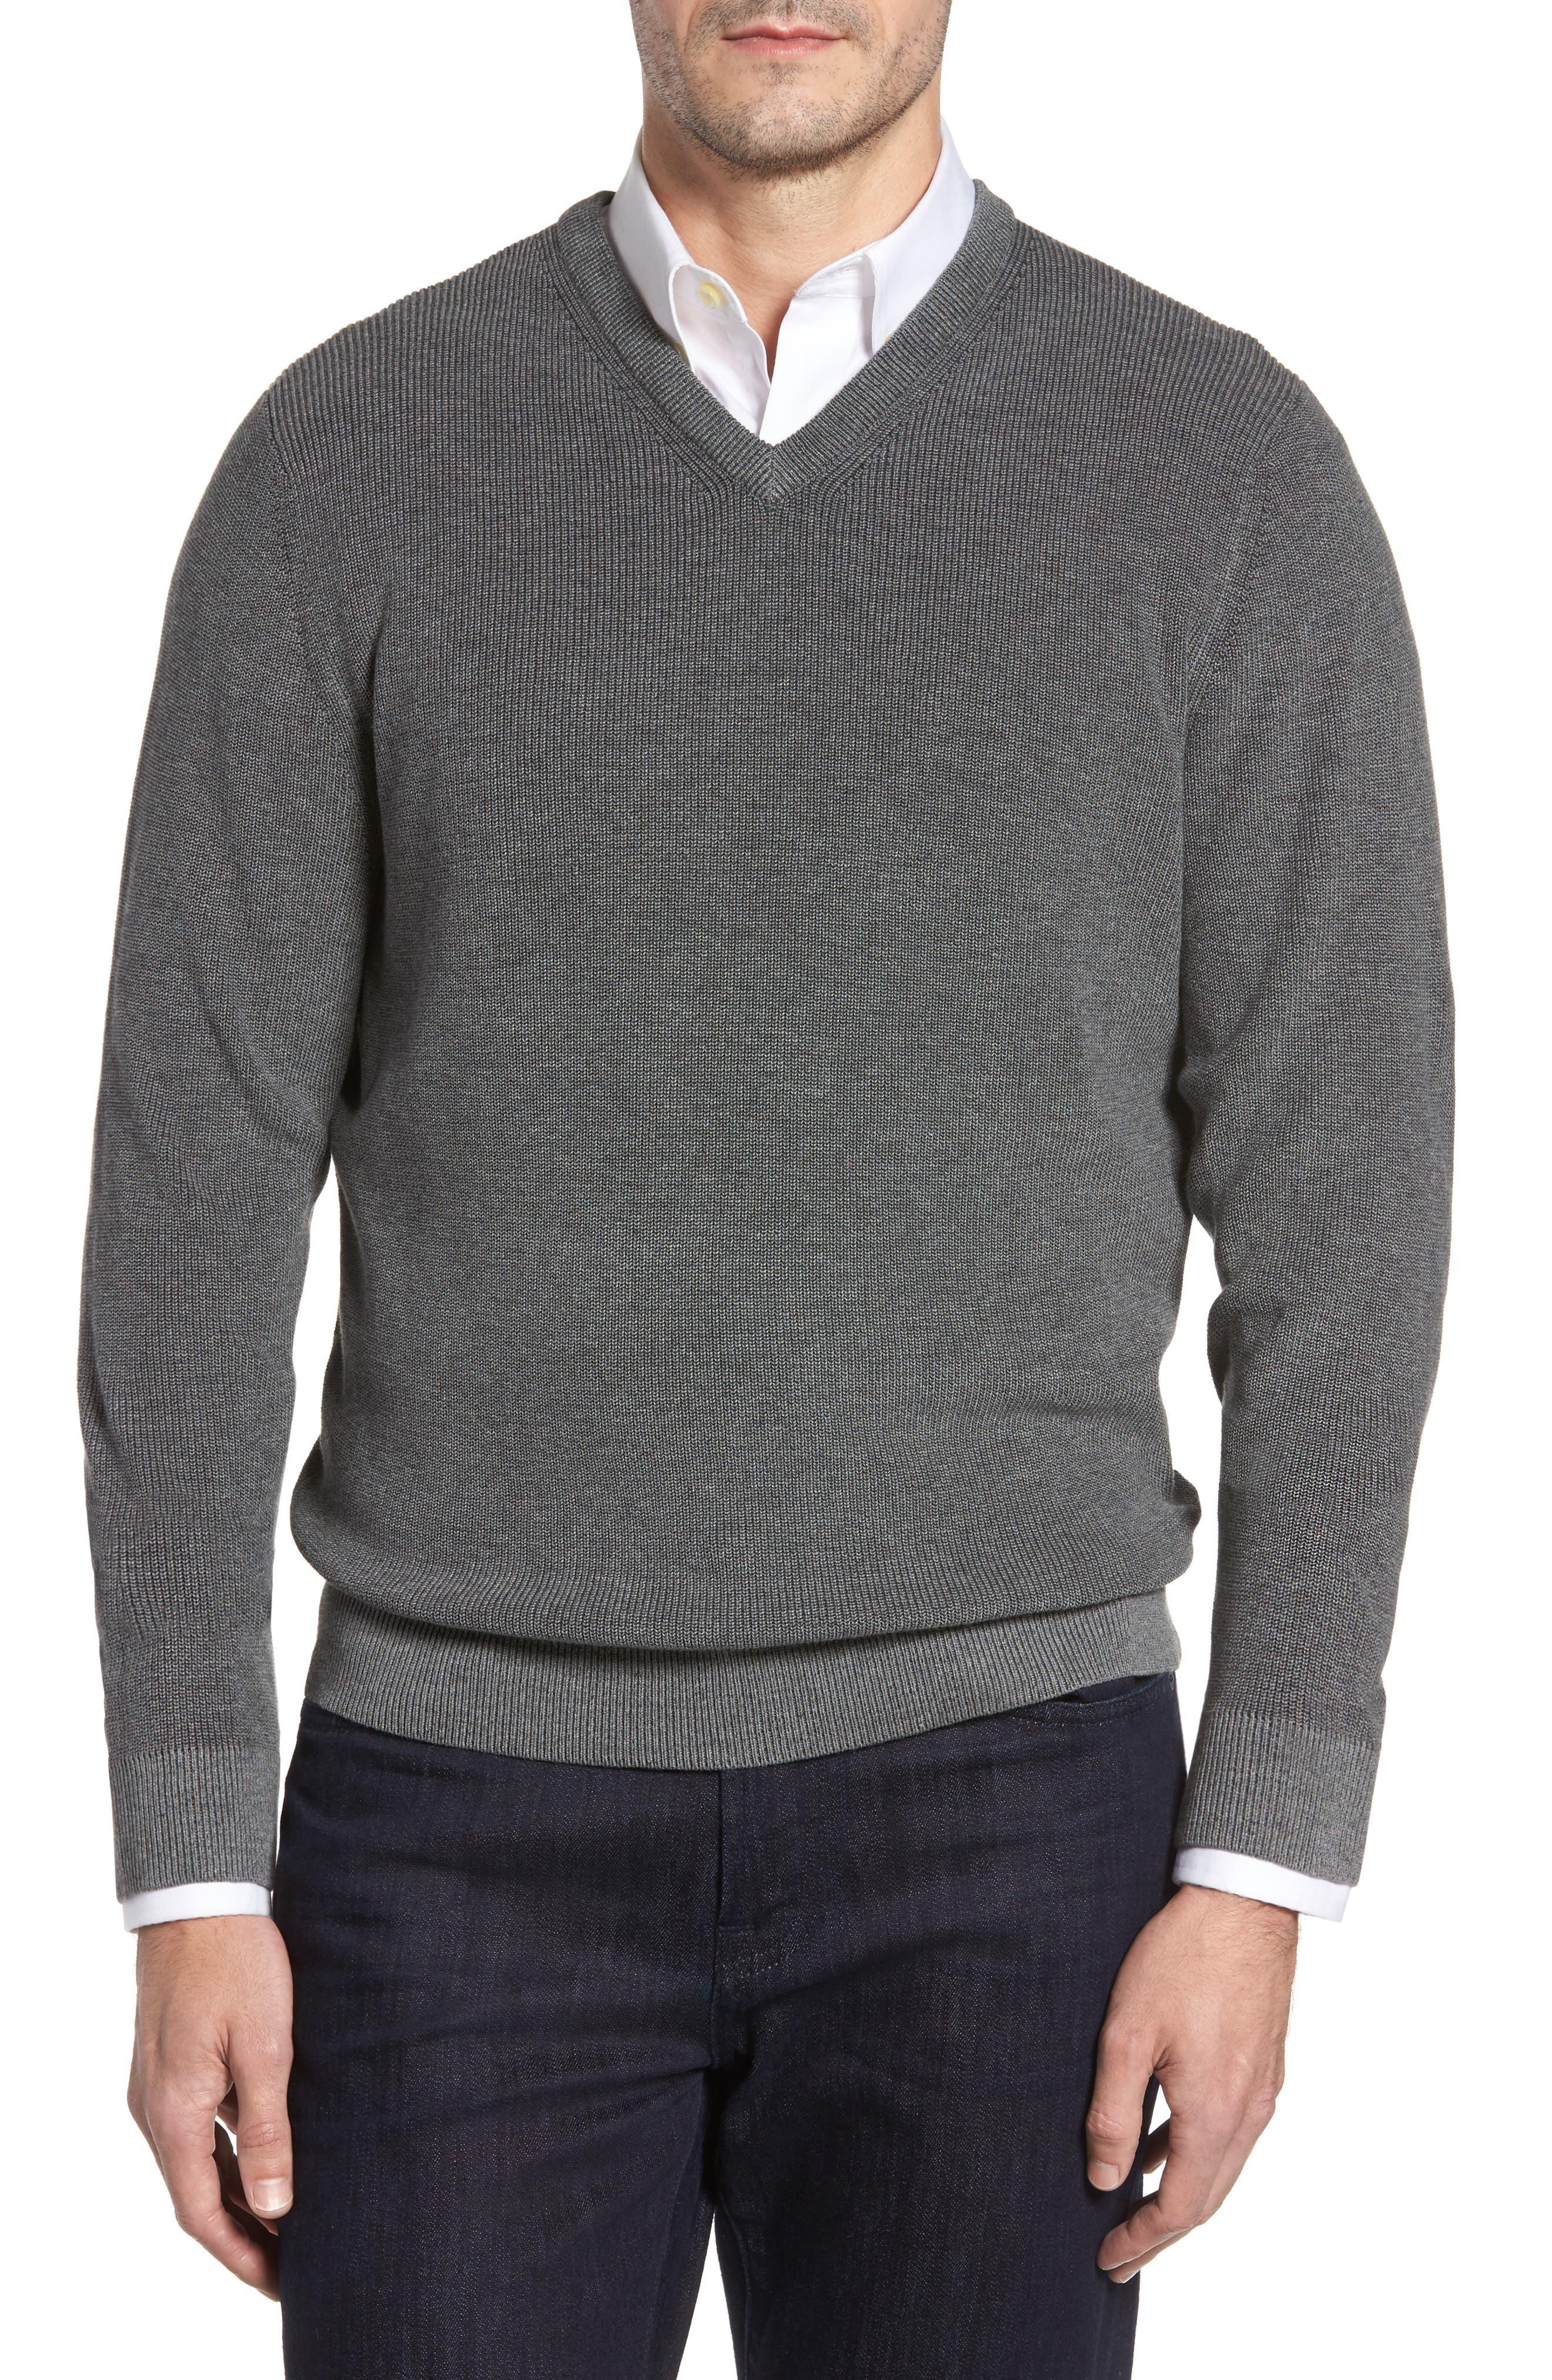 Las Palmas Reversible Sweater,                         Main,                         color, Charcoal Heather